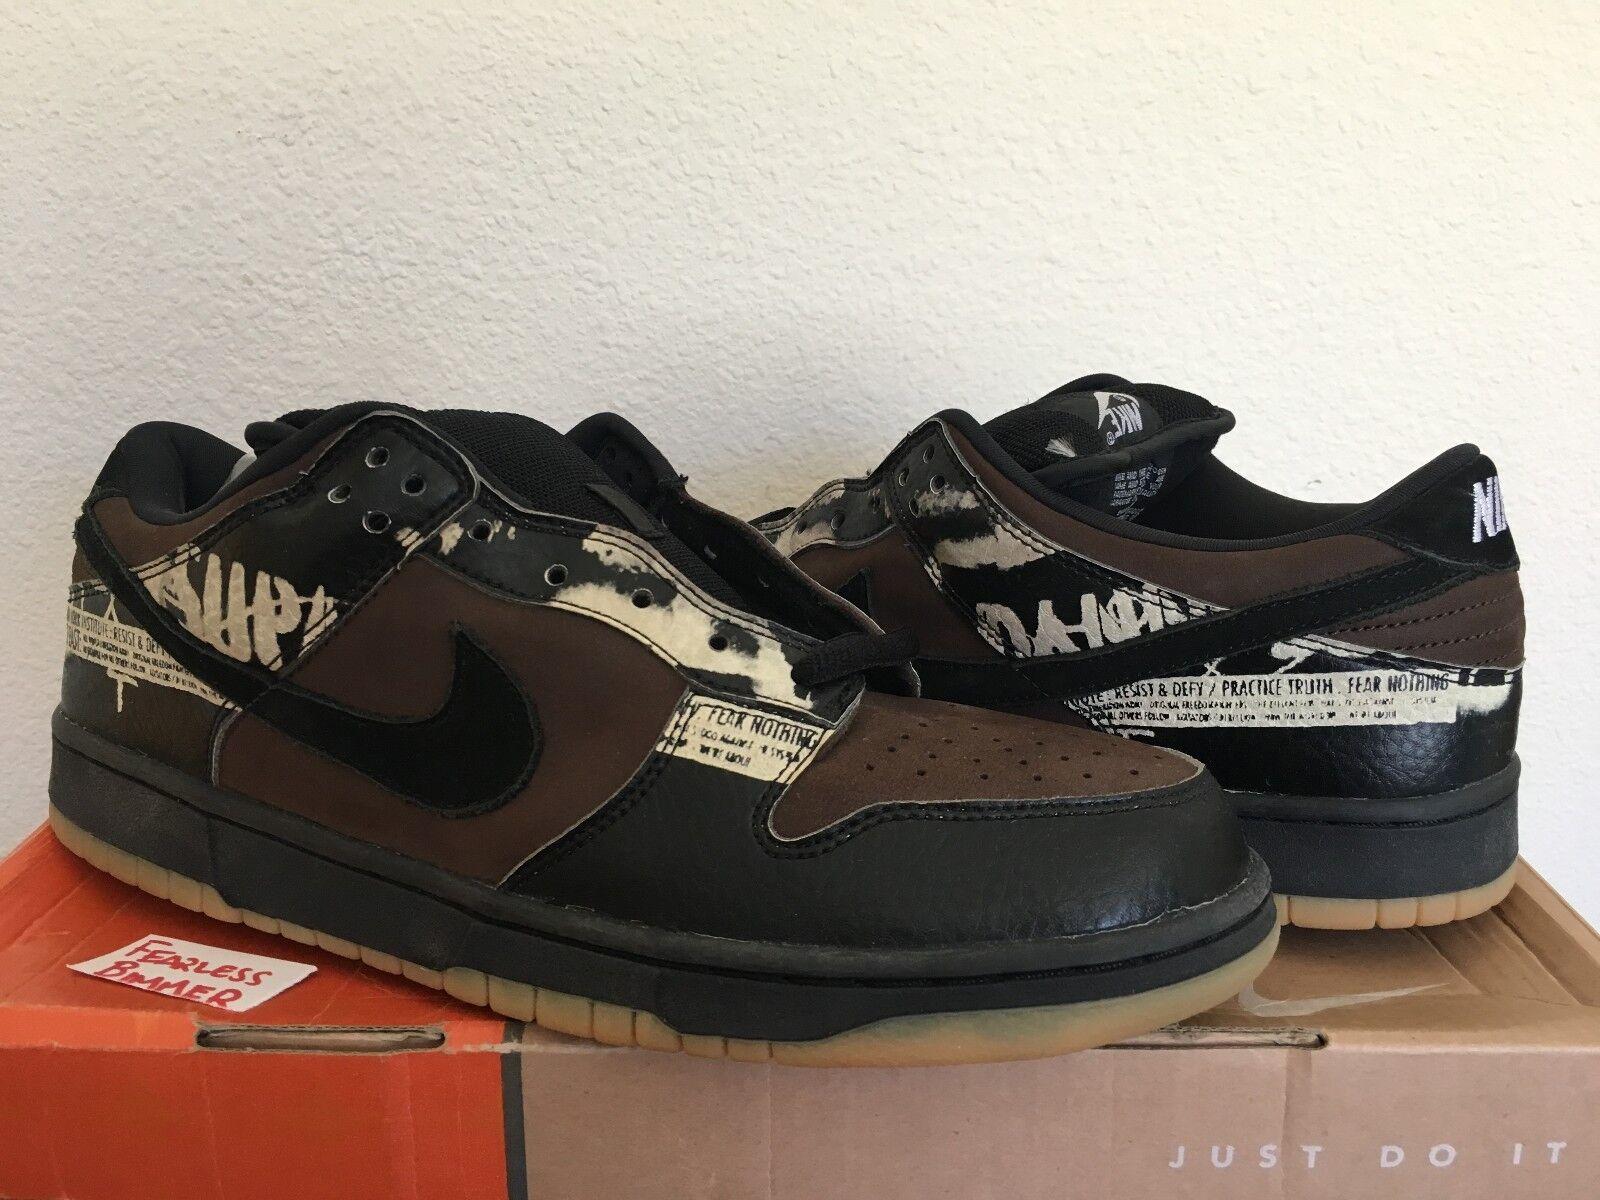 Nike e basso zoo pro sp zoo basso york sb 46 paul brown nero d837b1